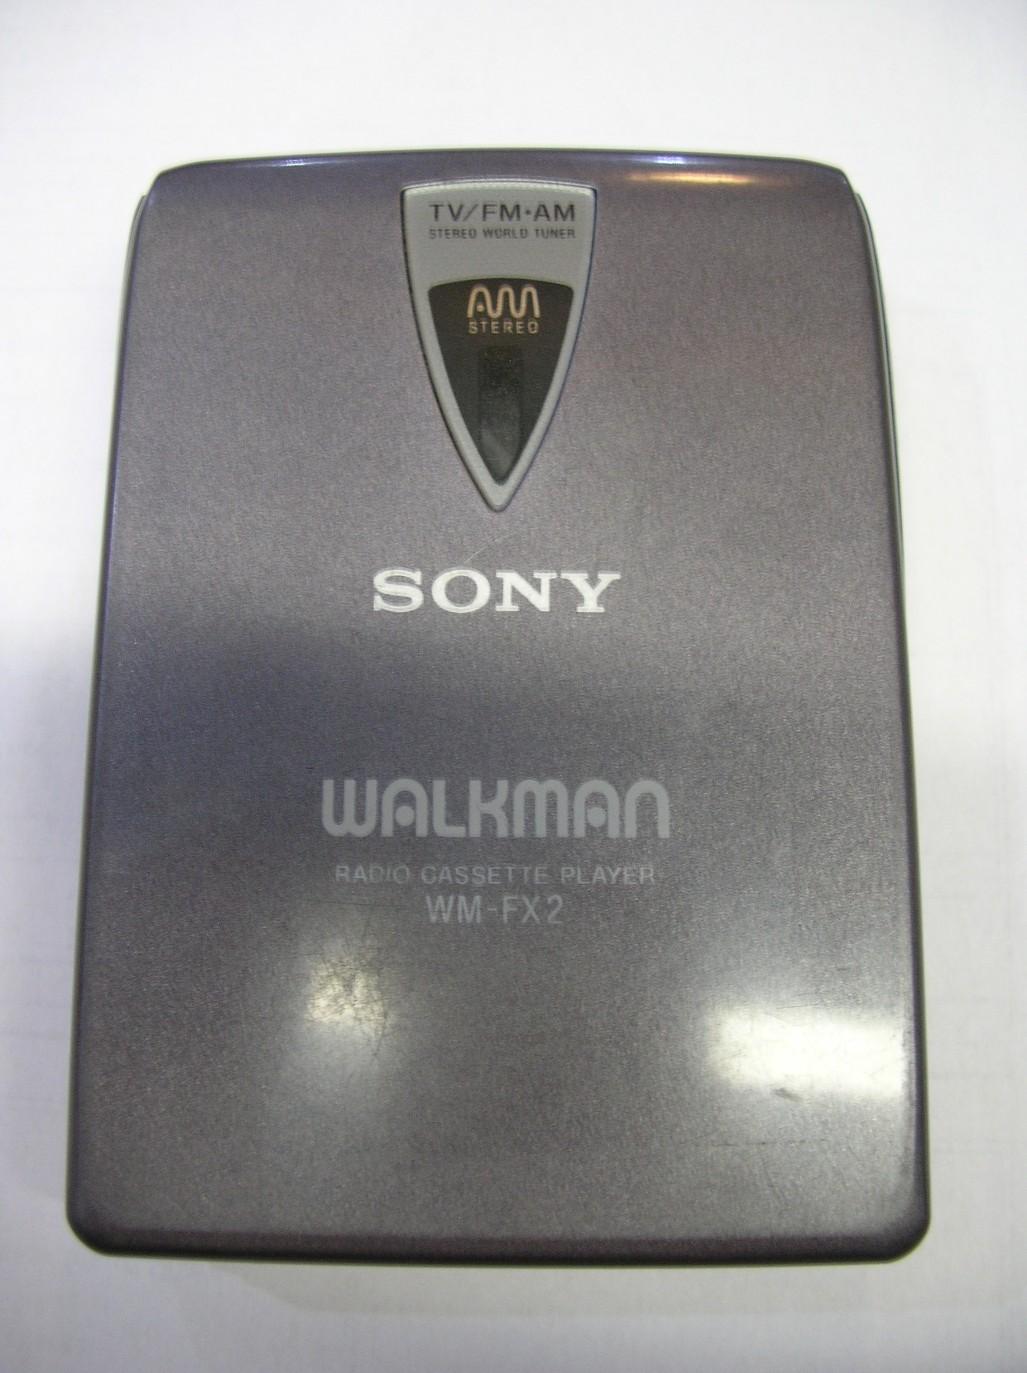 Sony WM FX2 Walkman TV/AM/FM Made in Japan Radio Cassette Player Gray